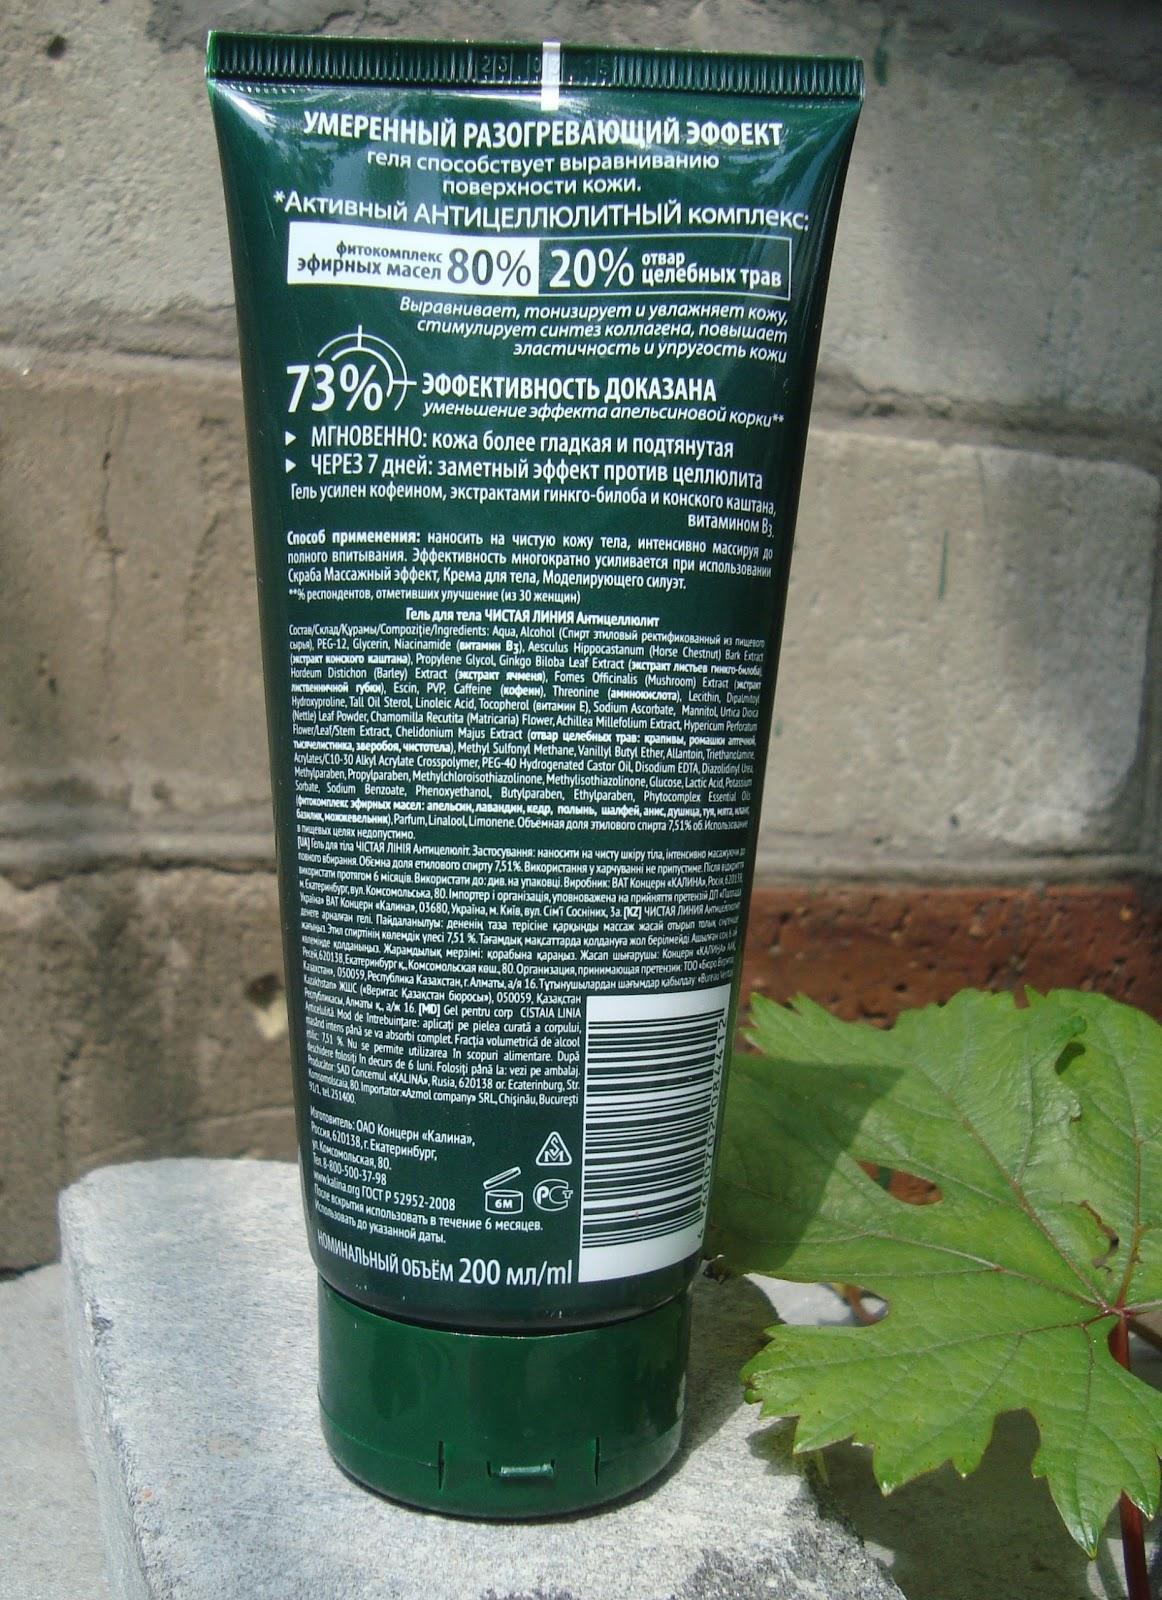 Ronkainen: травы для упругой кожи